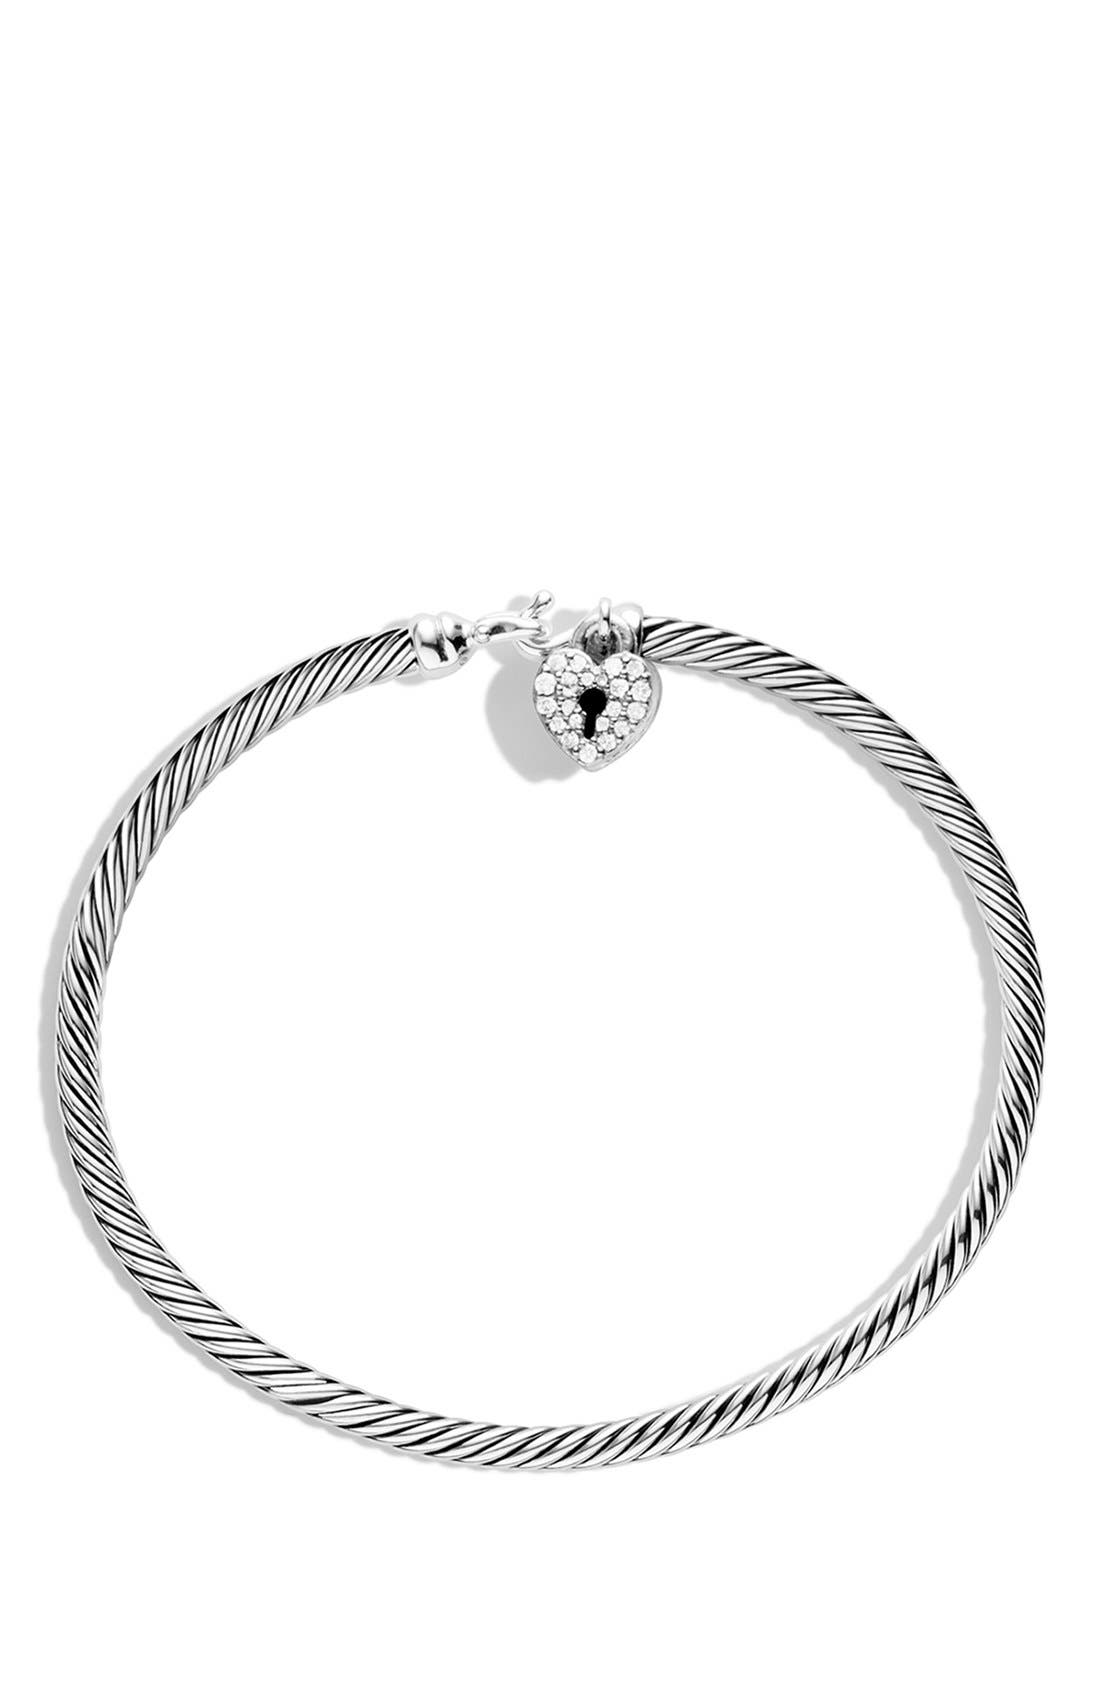 'Cable Collectibles' Heart Lock Bracelet with Diamonds,                             Alternate thumbnail 2, color,                             Diamond